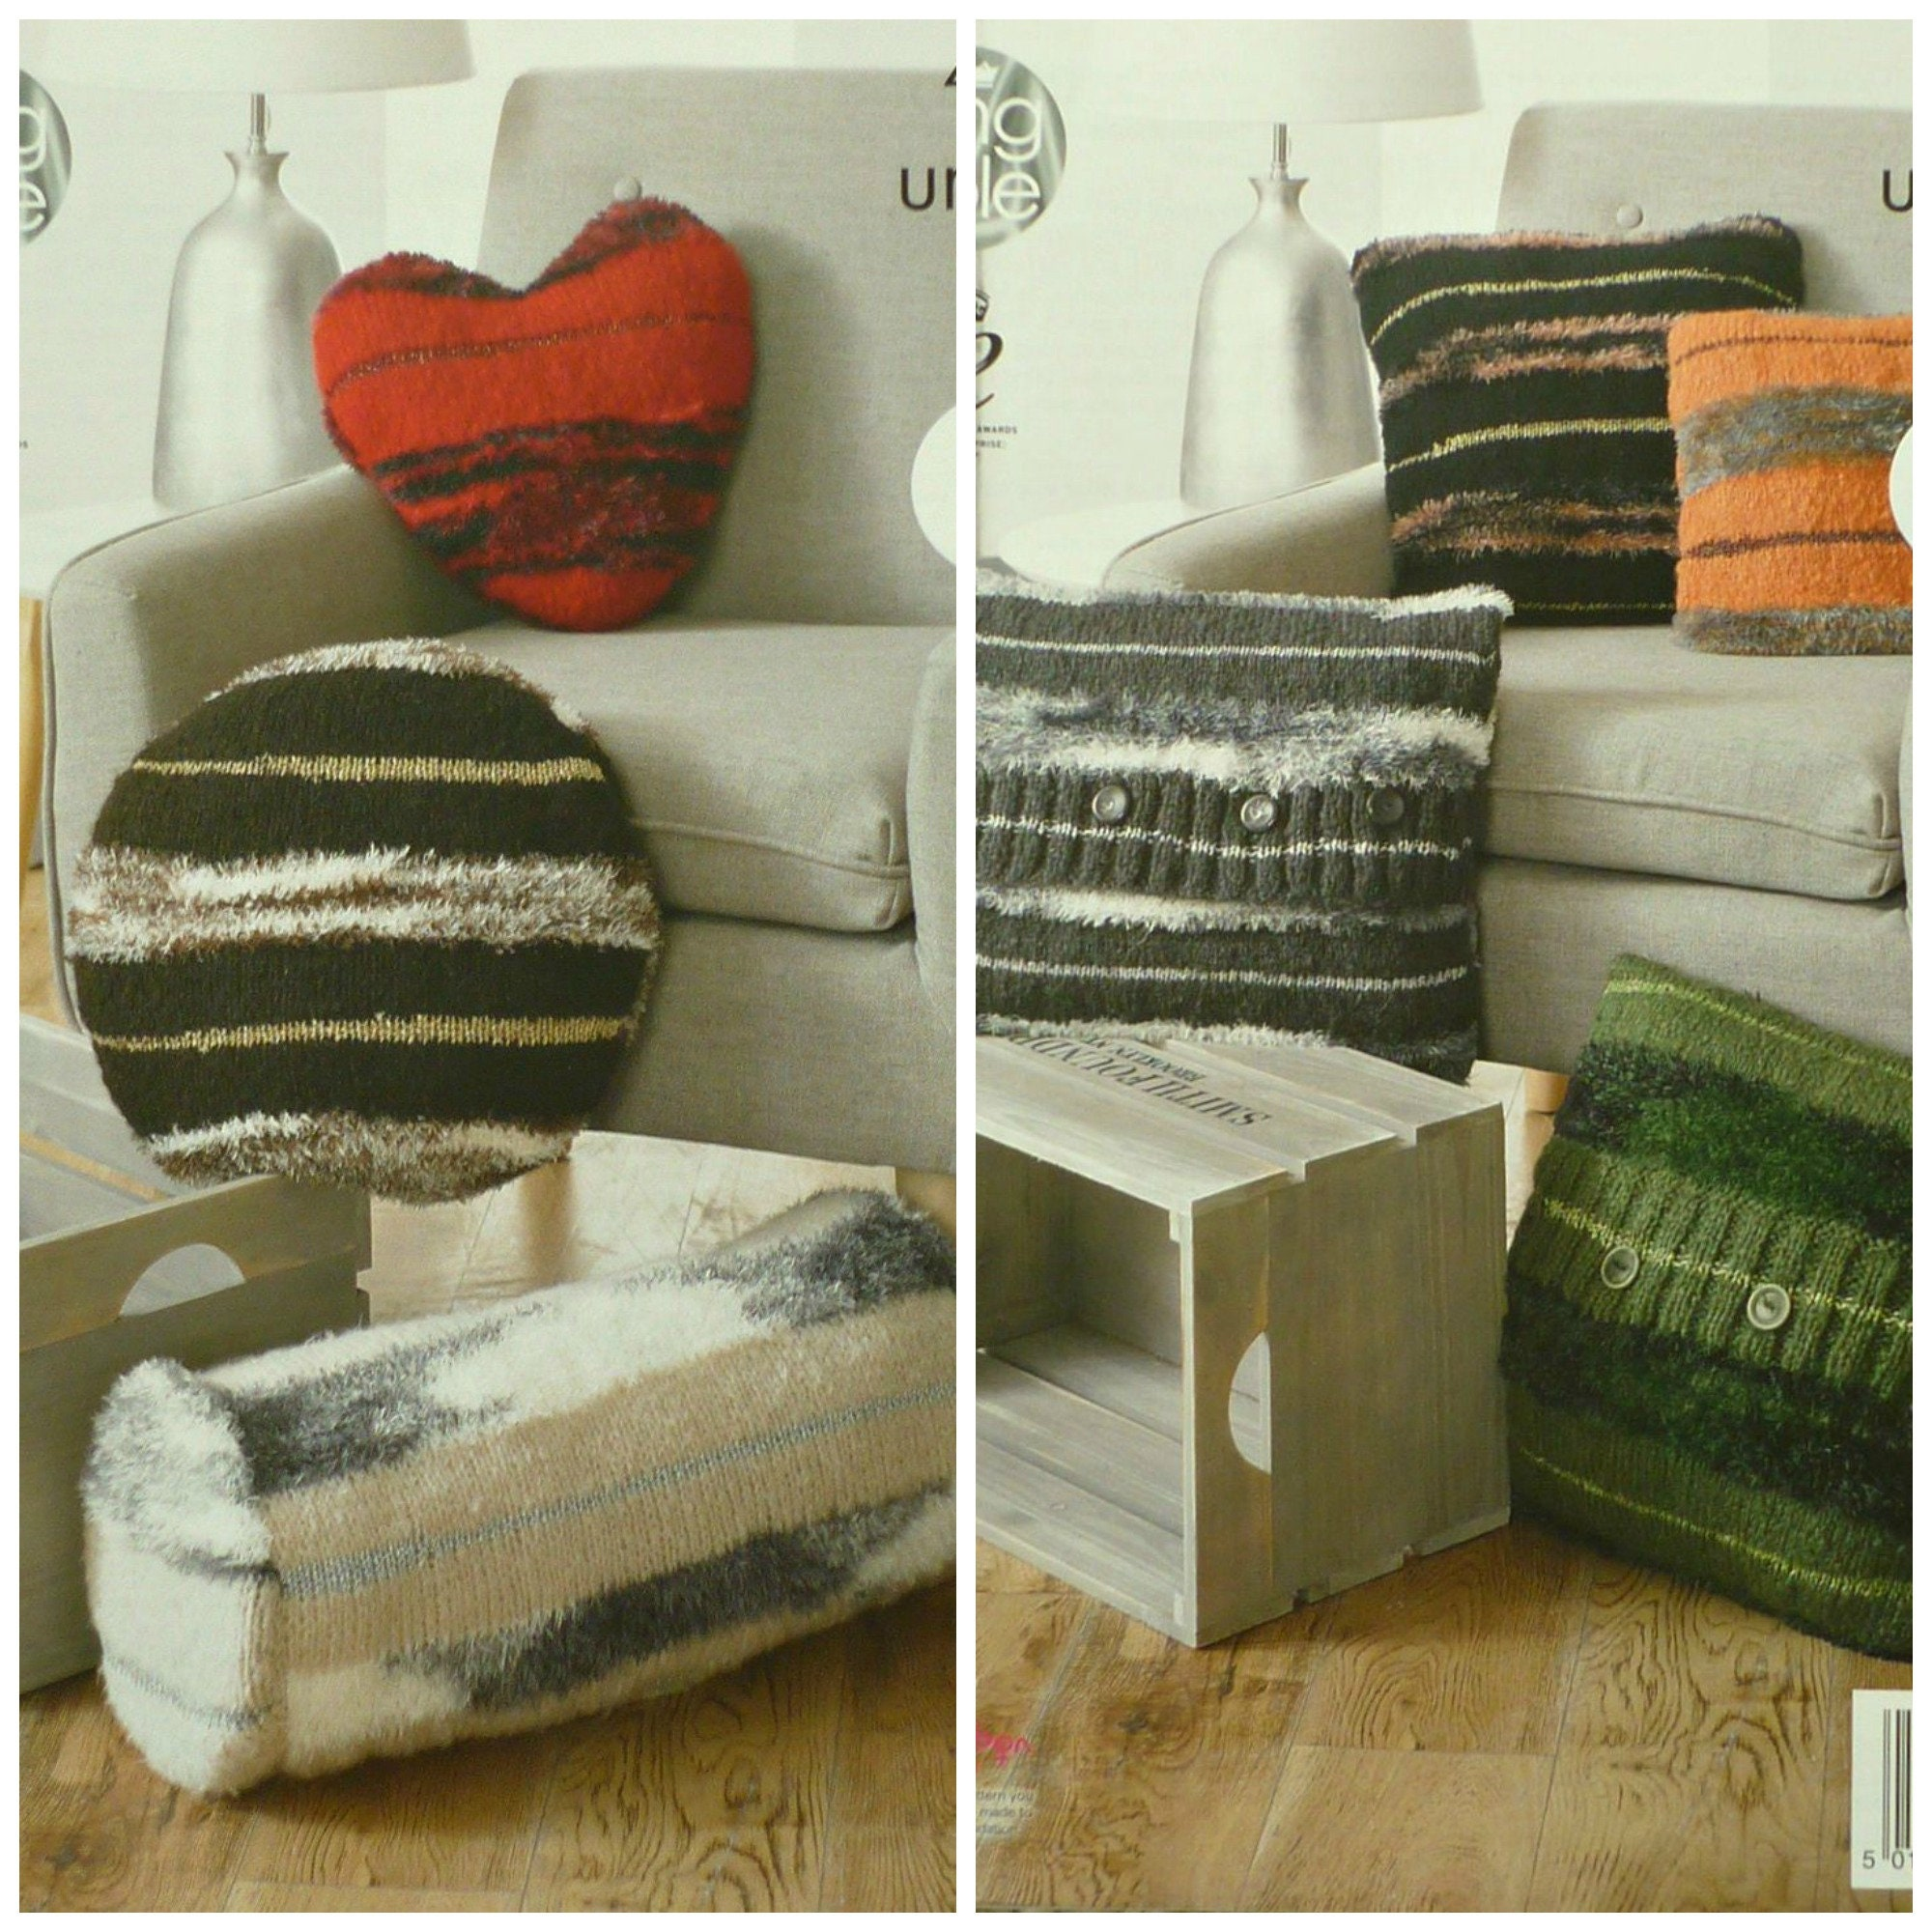 Cushion Knitting Pattern K4334 Heart Round Square Cushions